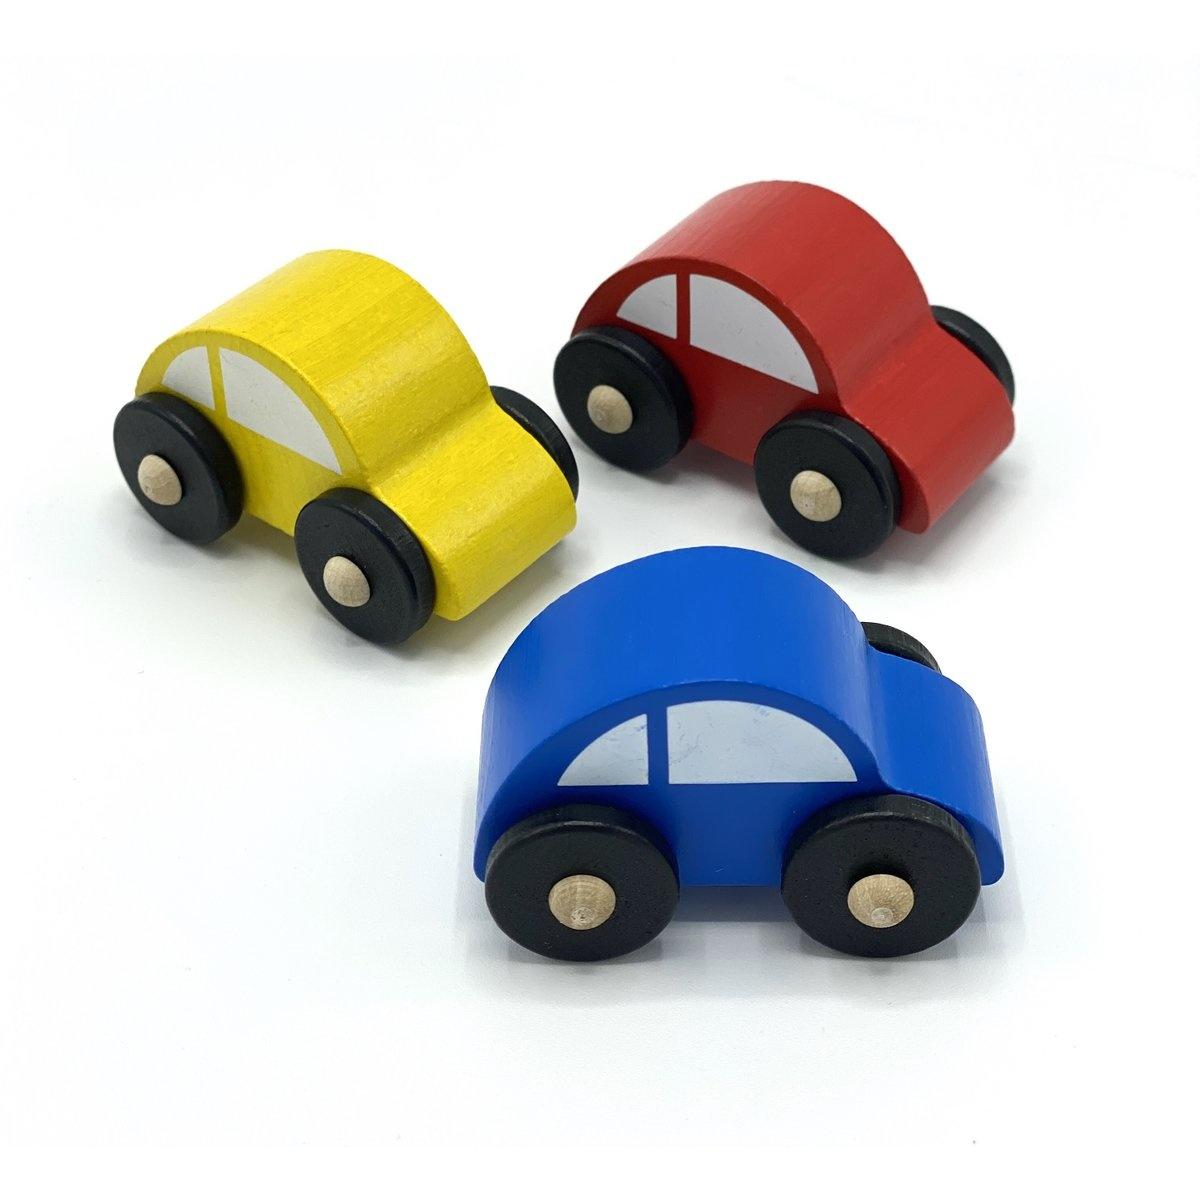 Speelmat autobaan Tiny Magic-2